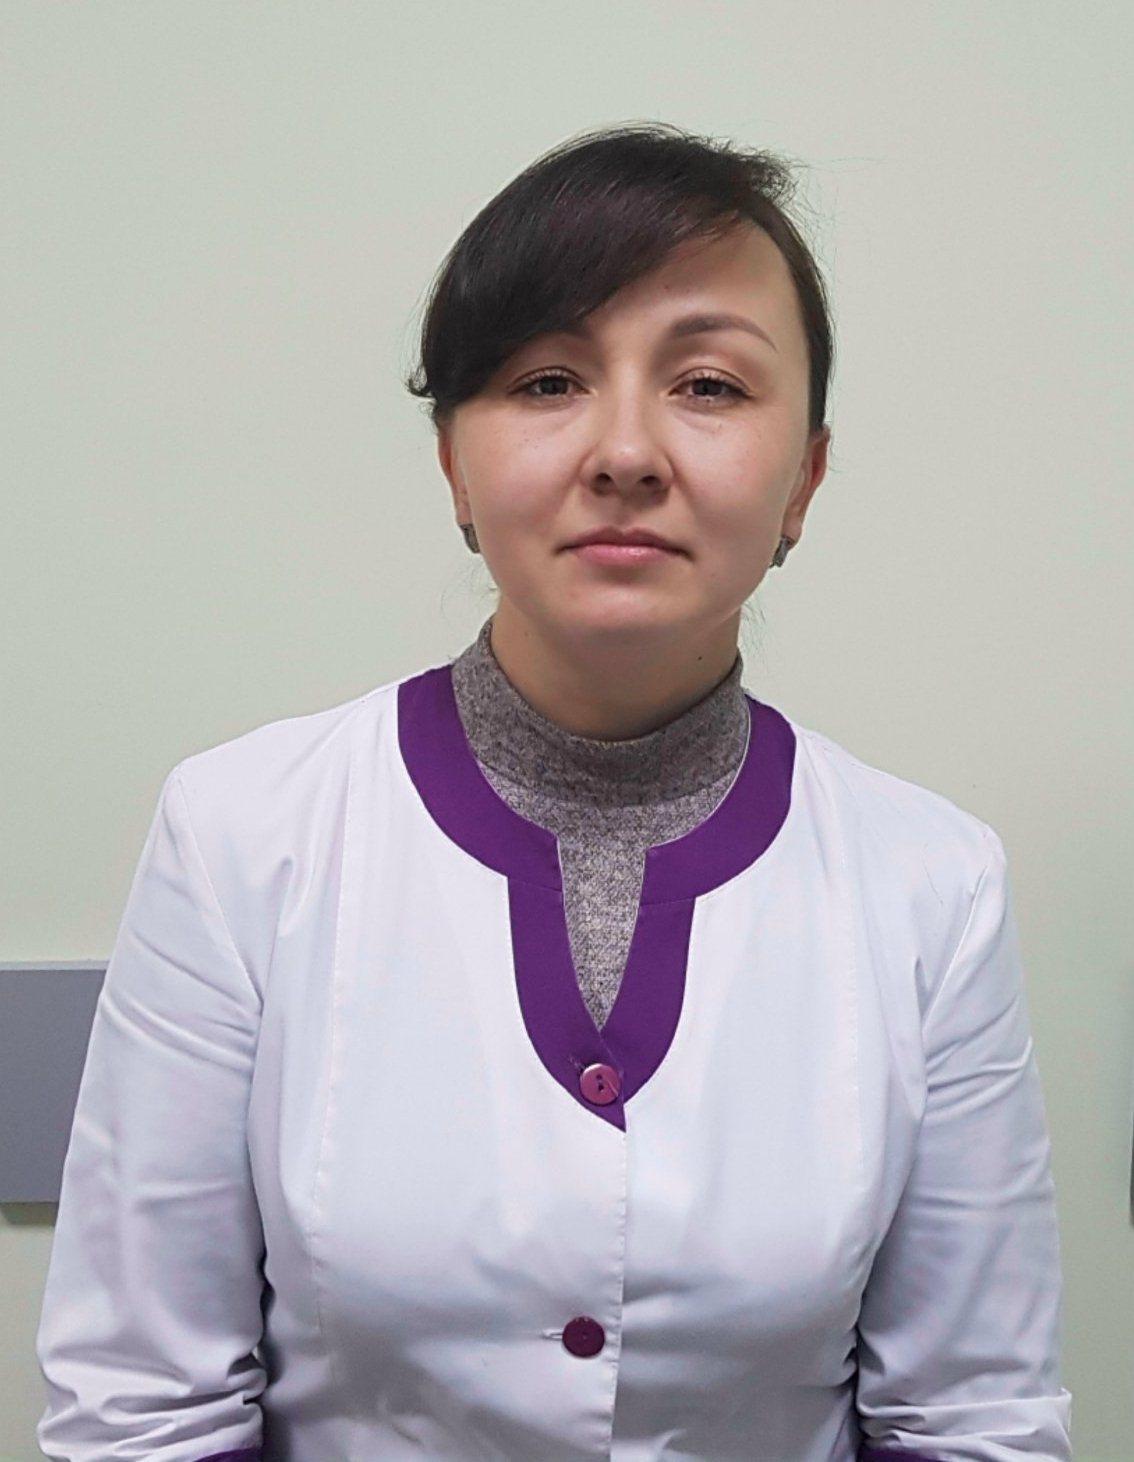 Гаврилова Инесса Николаевна